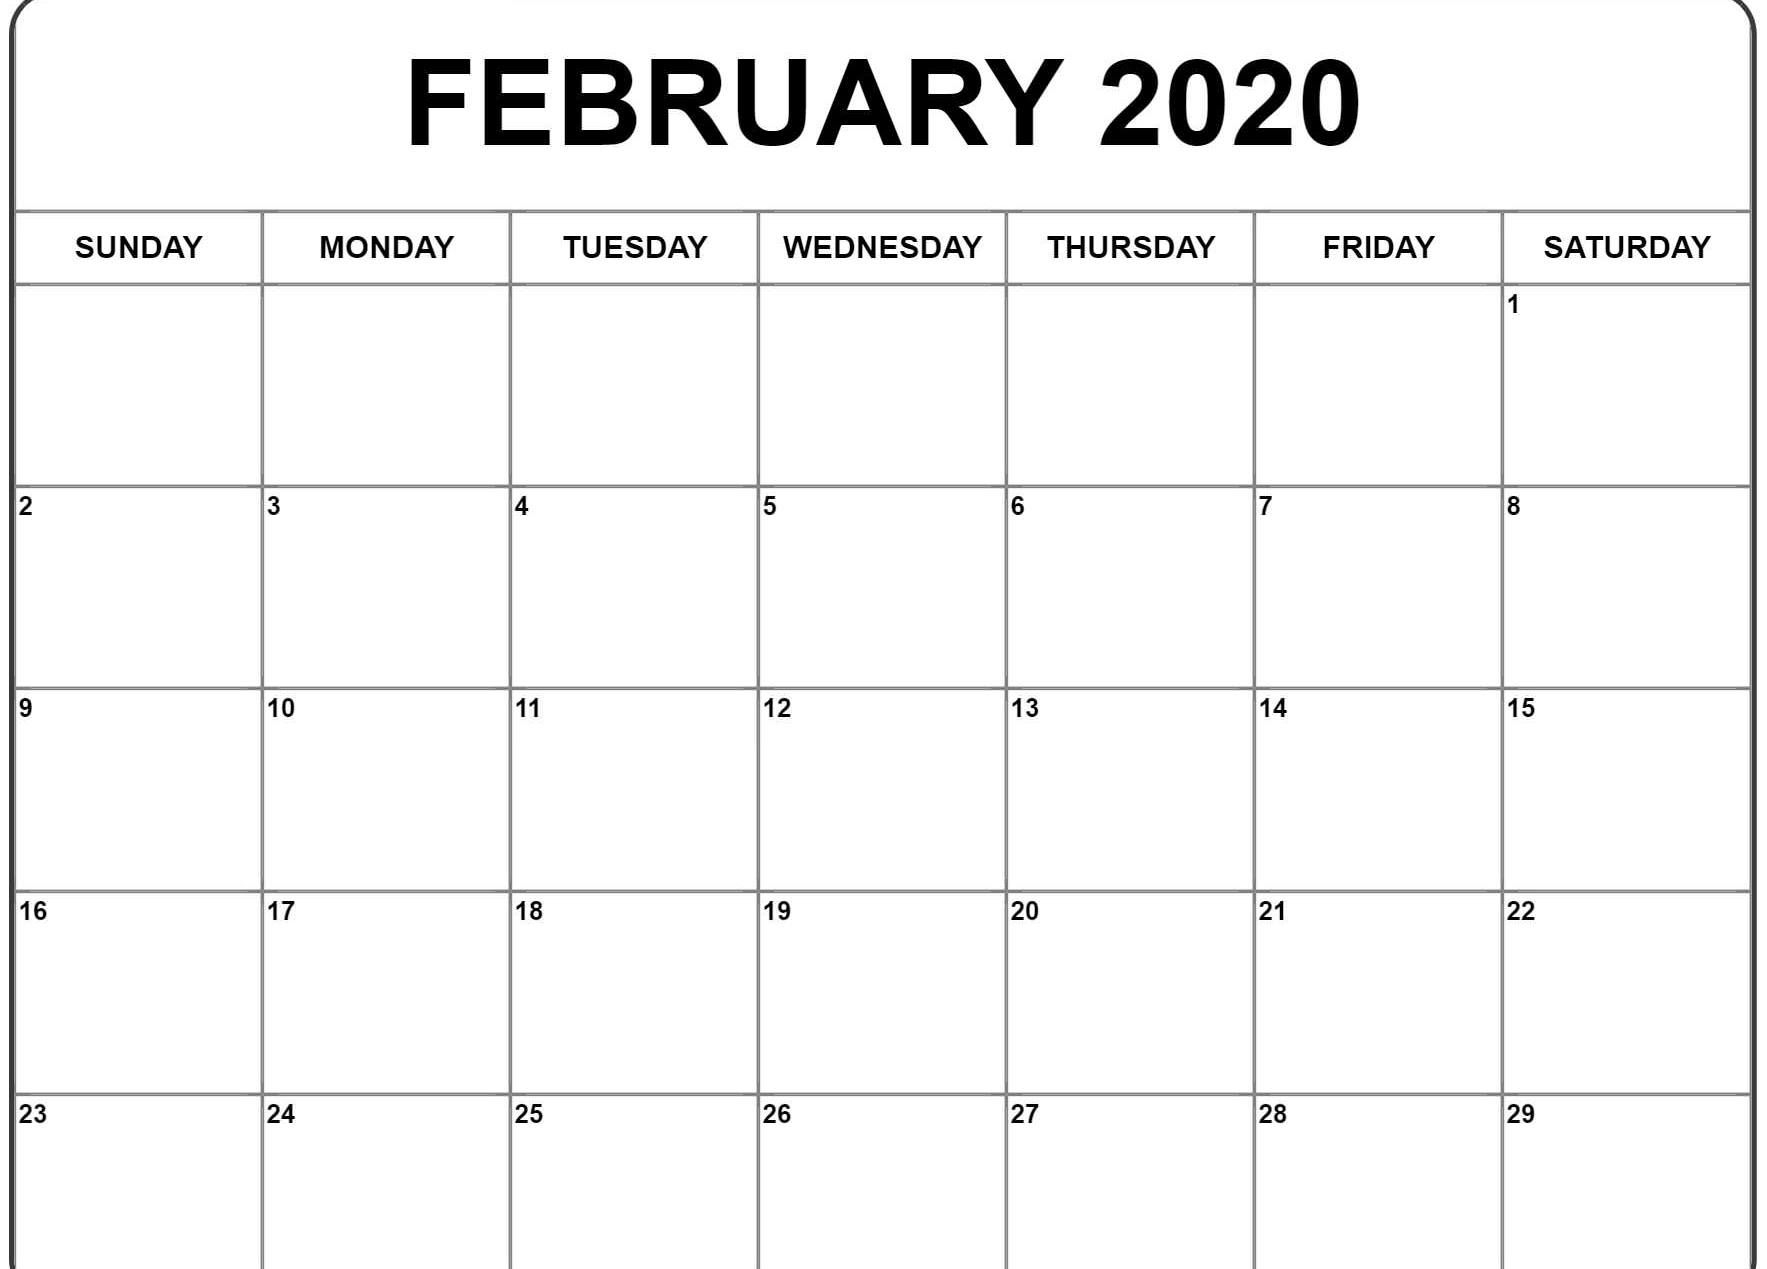 Blank February 2020 Calendar Template Pdf, Word, Excel